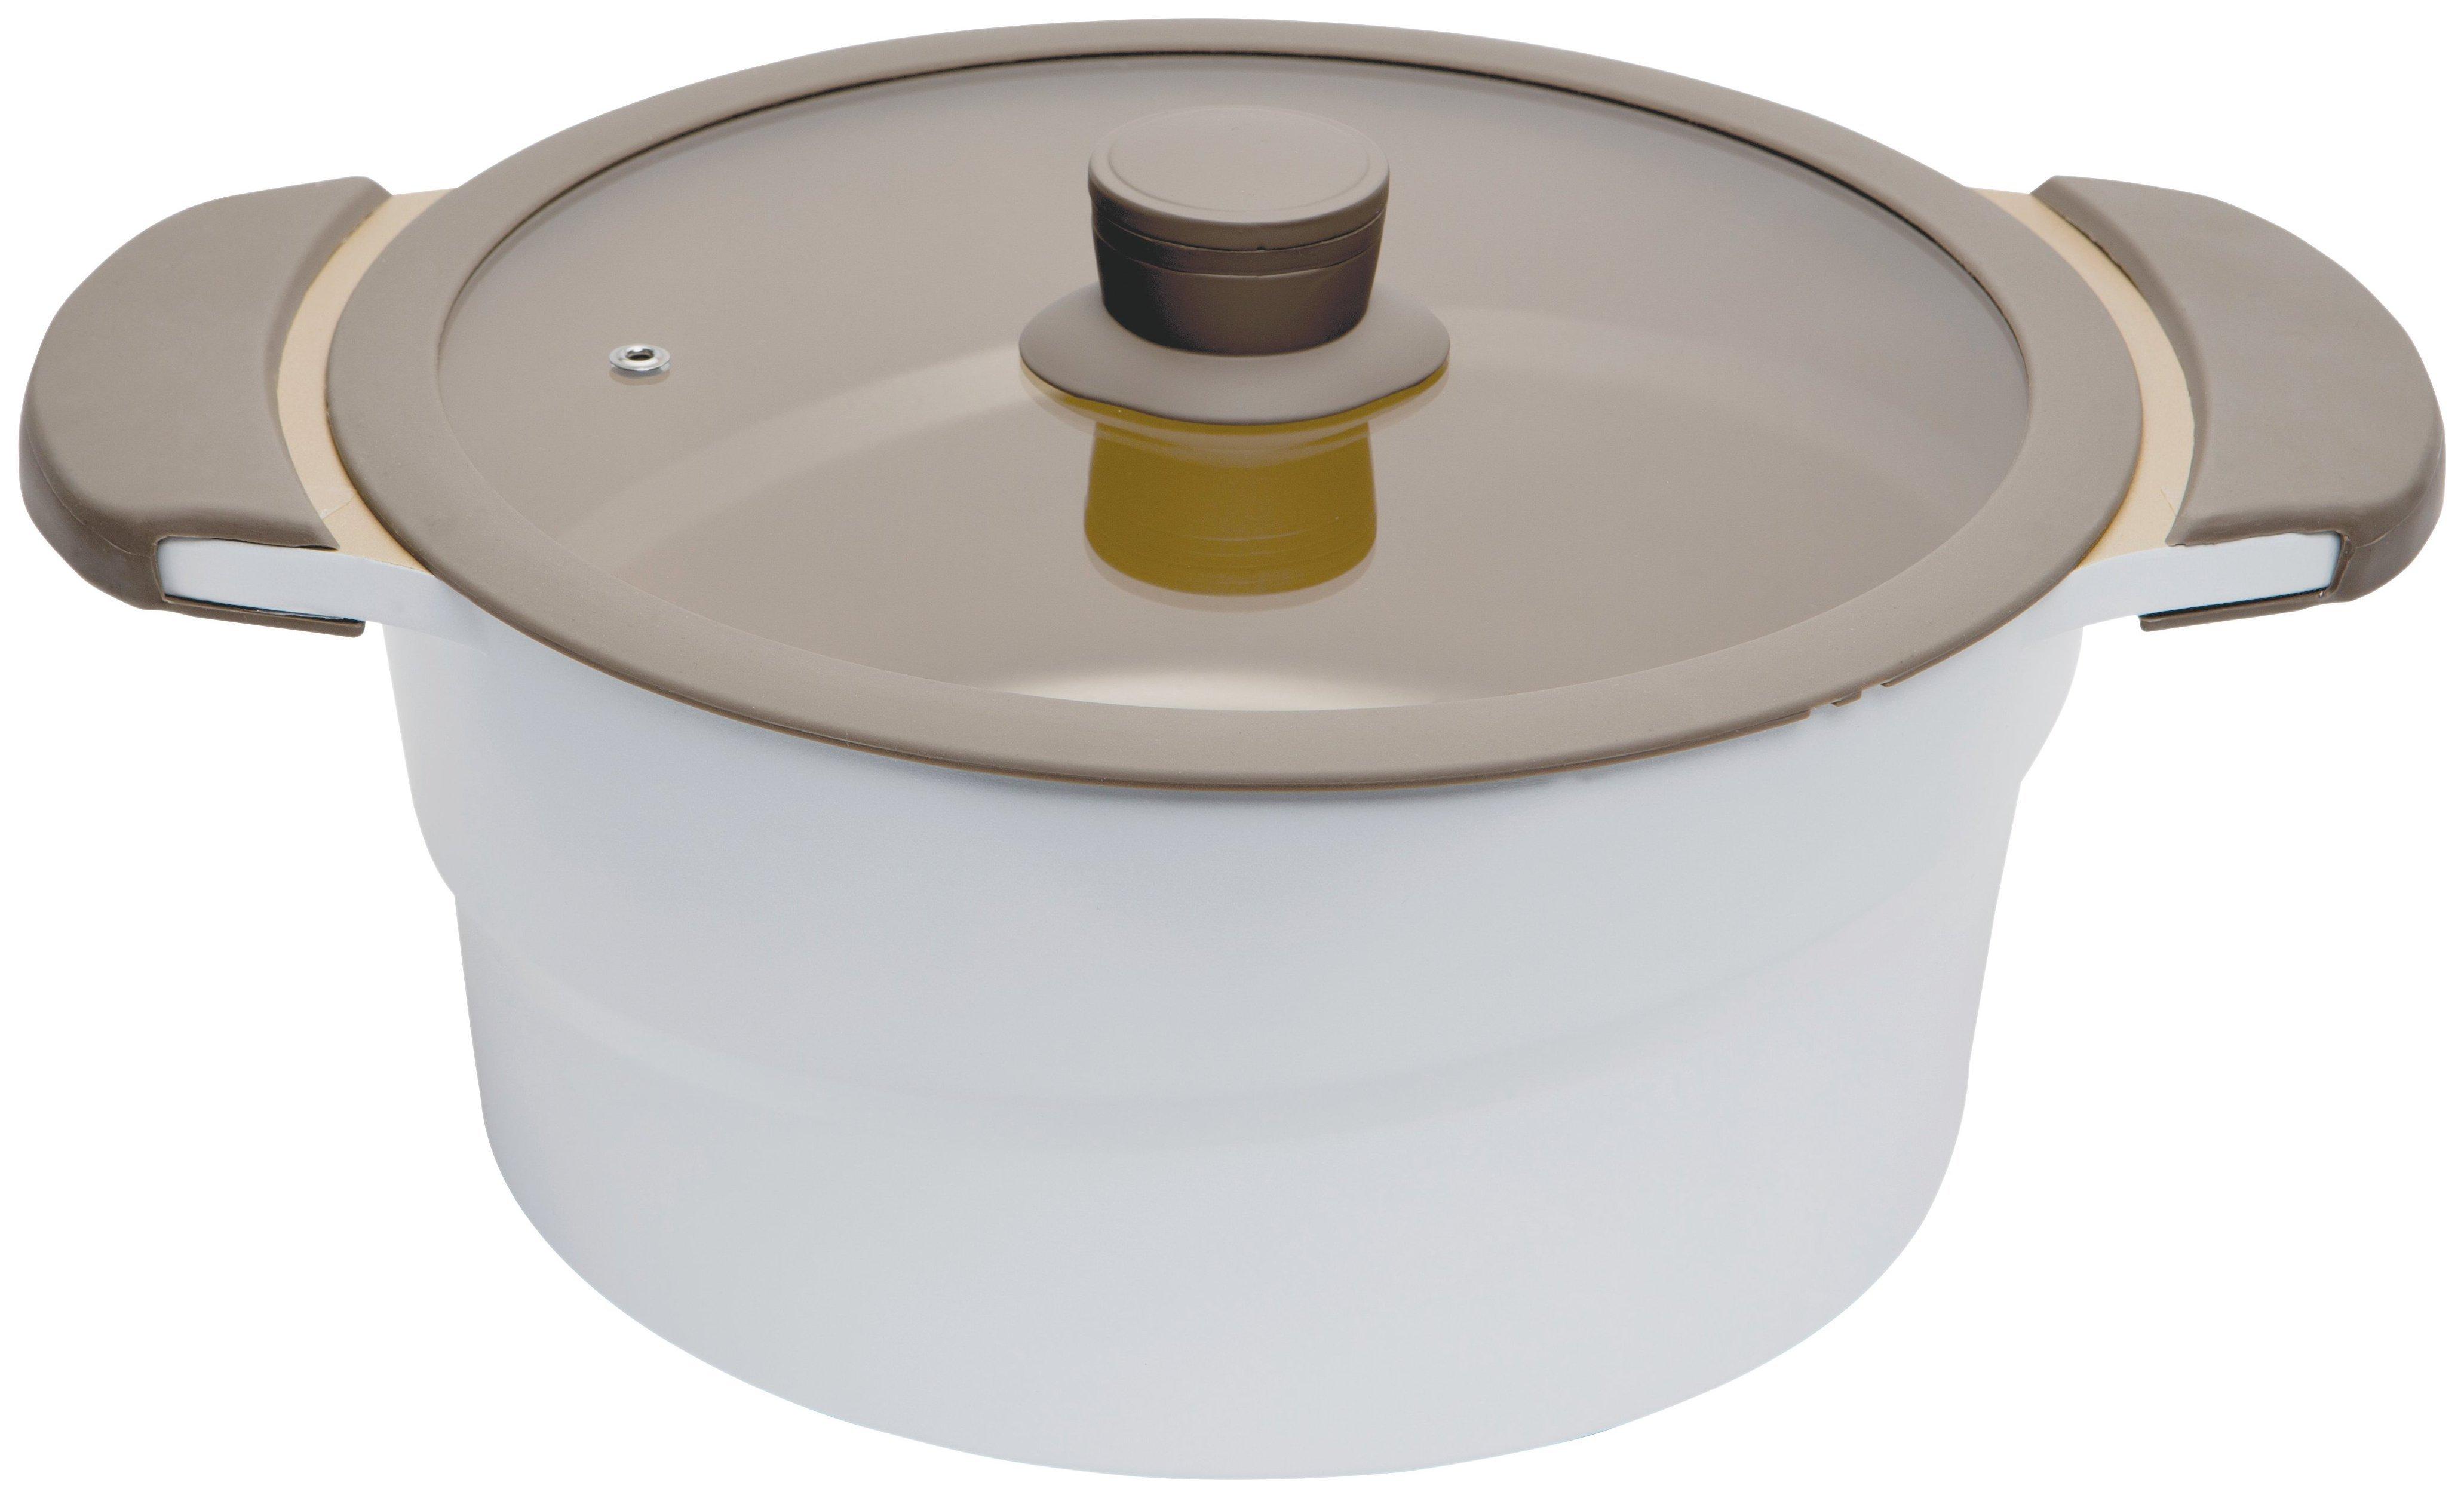 Image of Prestige 24cm Casserole Dish with Glass Lid - 4.6L.